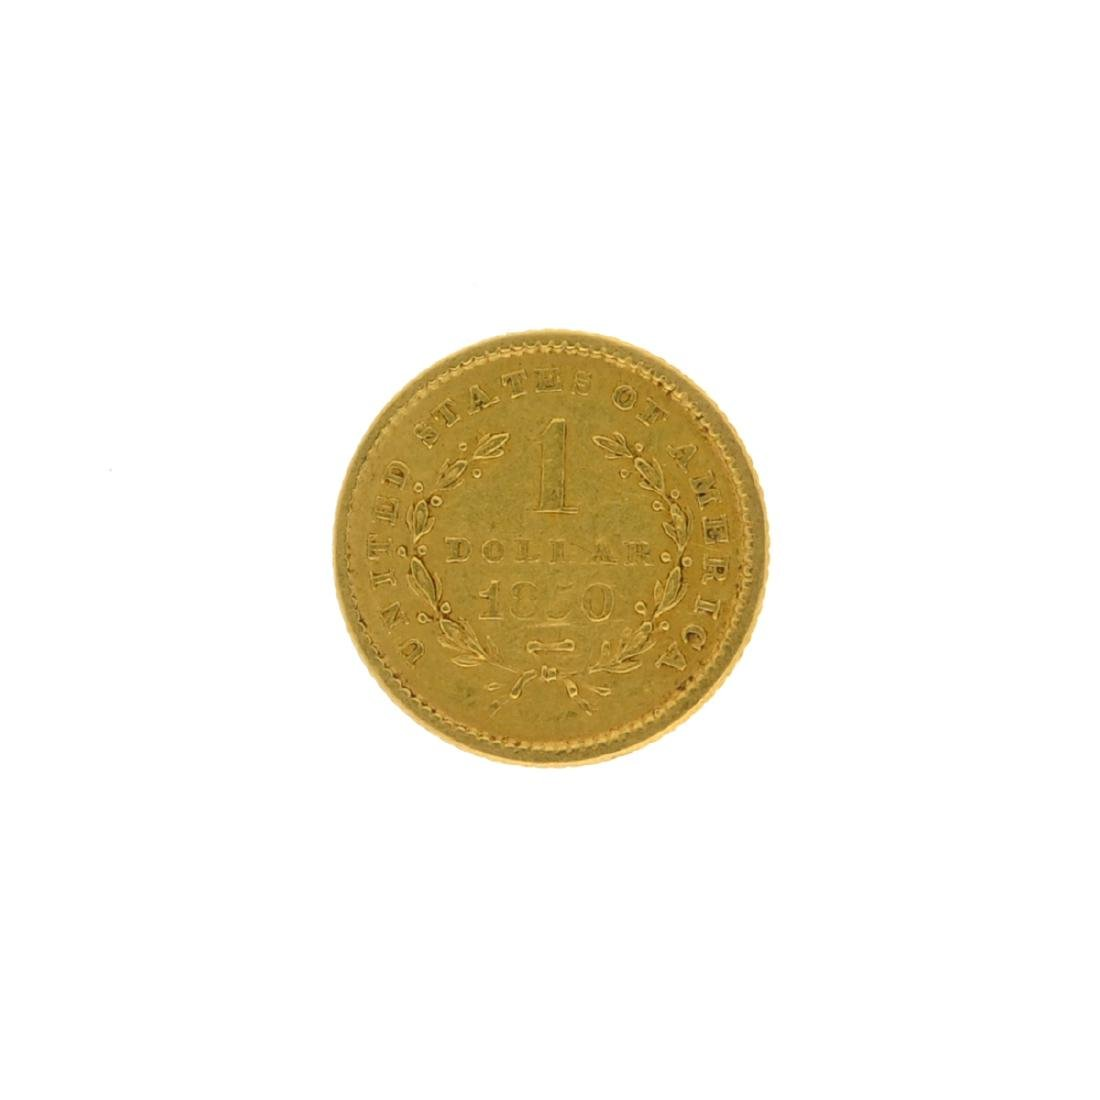 1850 $1 U.S. Liberty Head Gold Coin